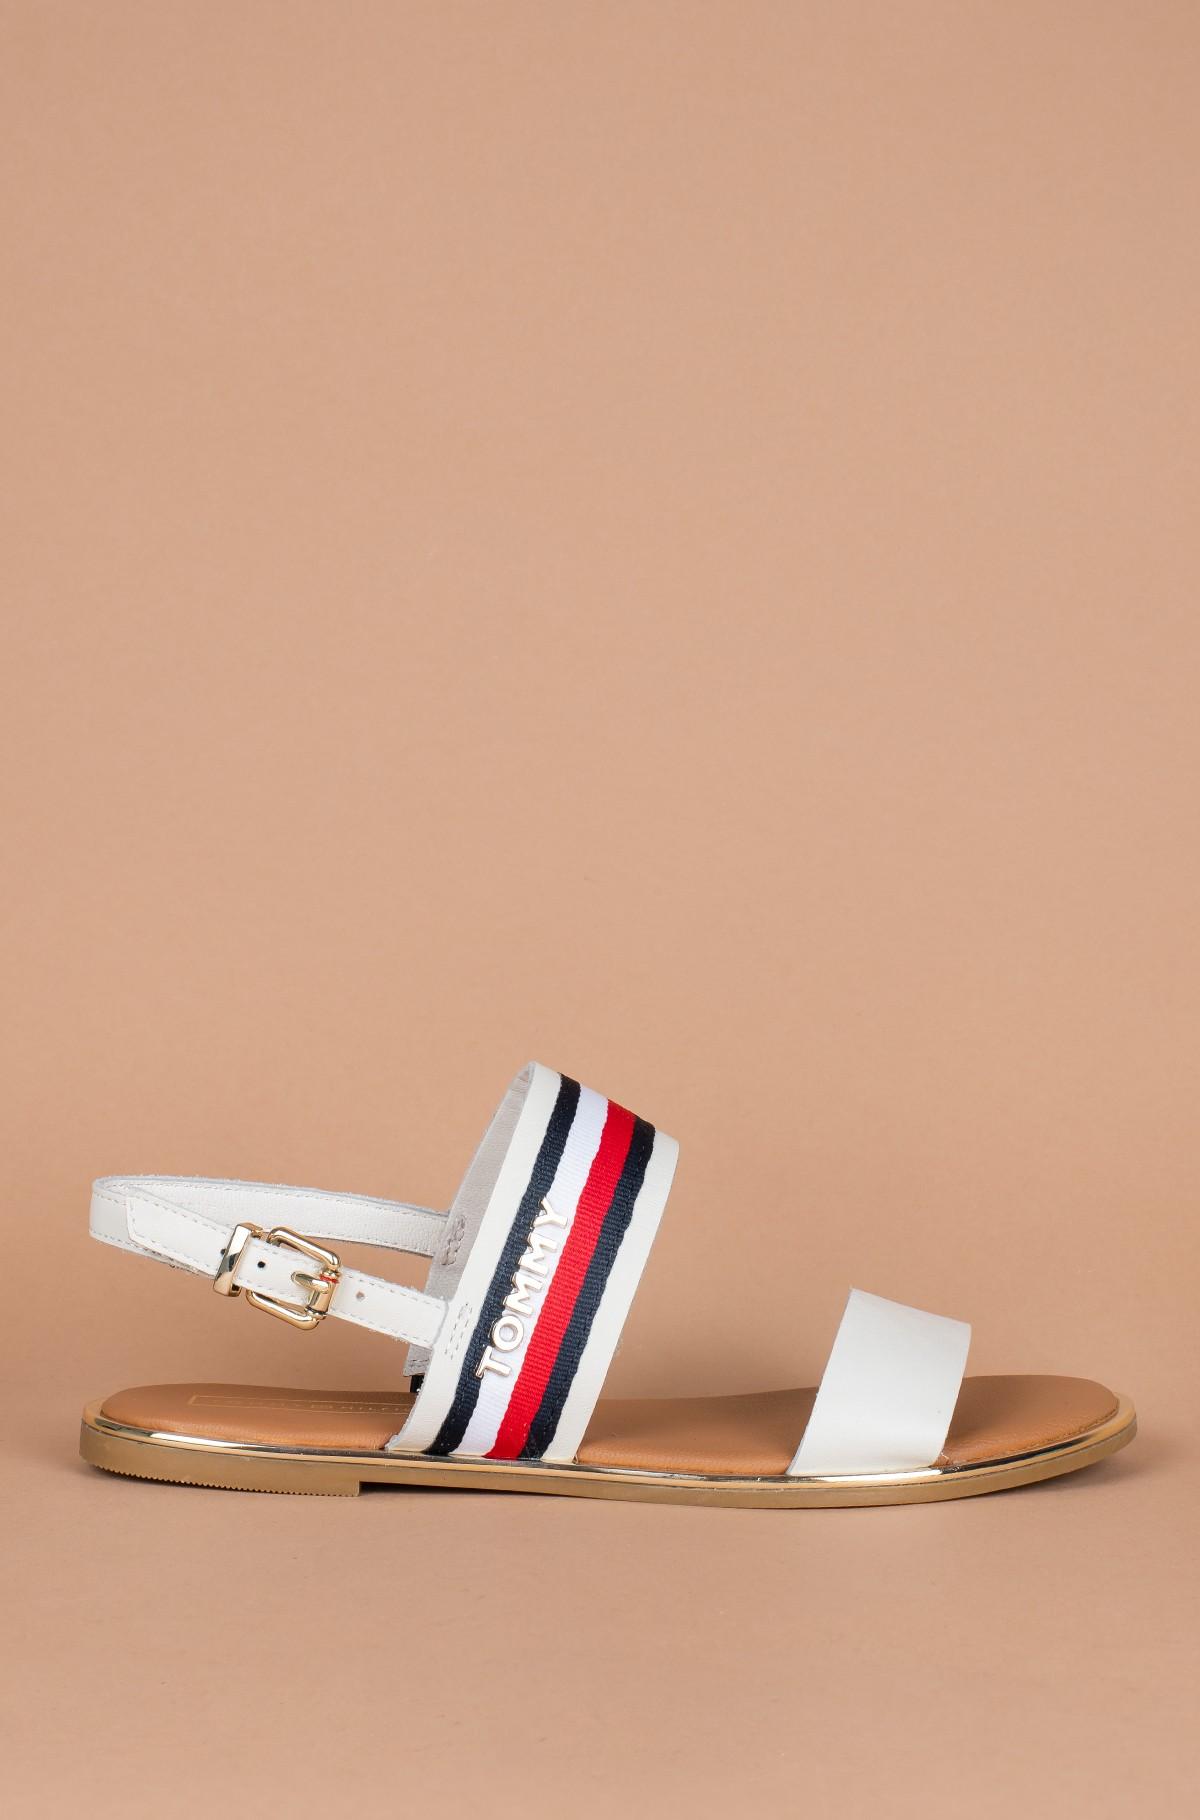 Sandales FLAT SANDAL CORPORATE RIBBON-full-1